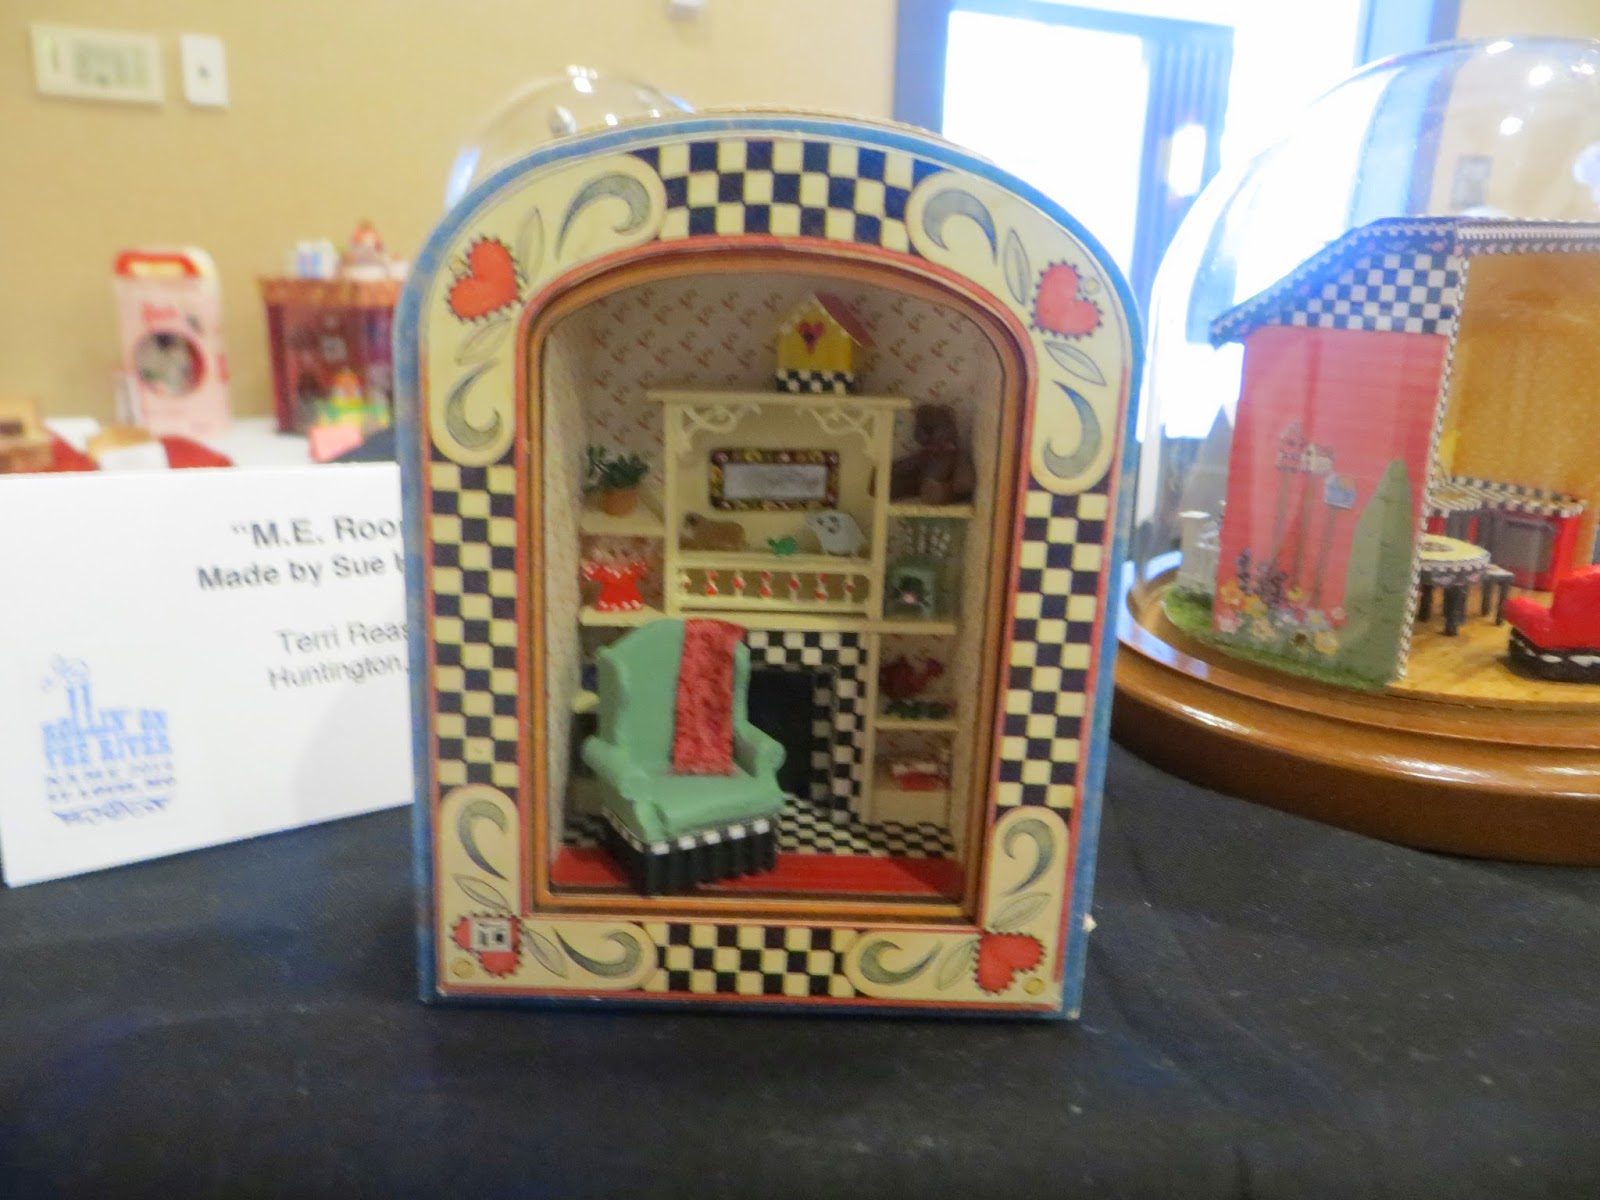 The Peripatetic Miniaturist St Louis Name Exhibits